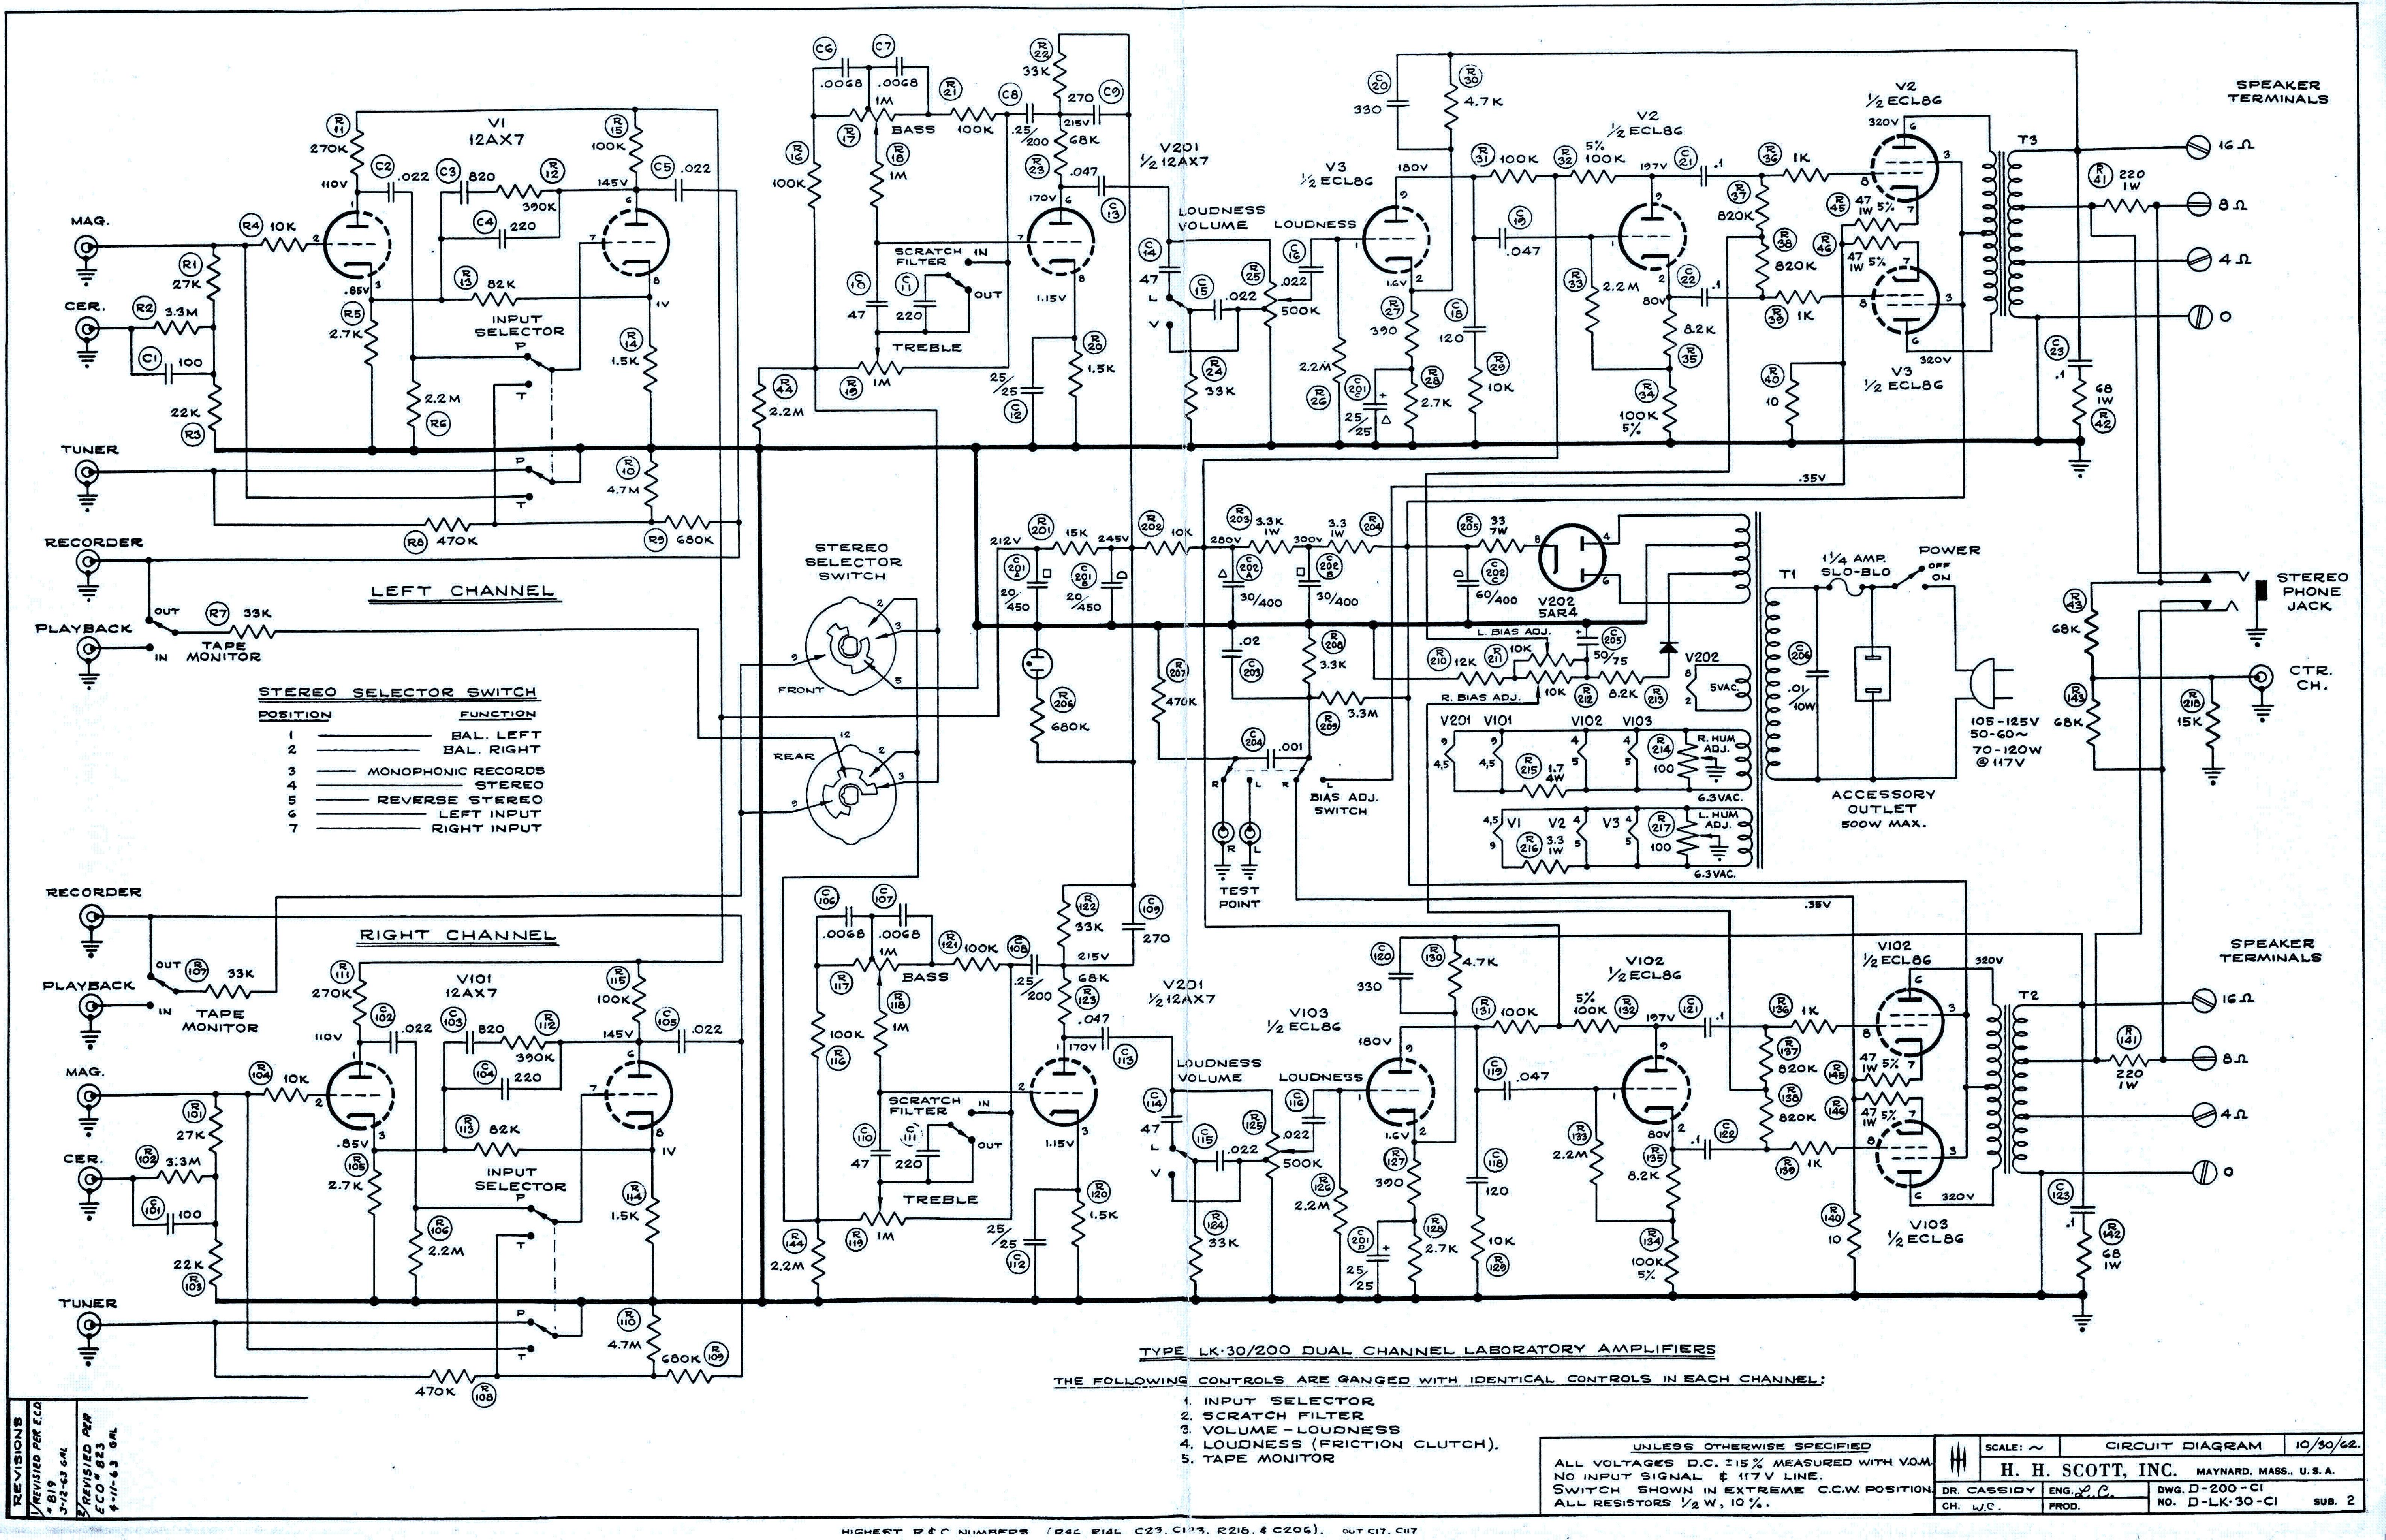 scott 299b sch service manual download schematics eeprom repair rh elektrotanya com Schematic Block Diagram TV Repair Schematic Diagram